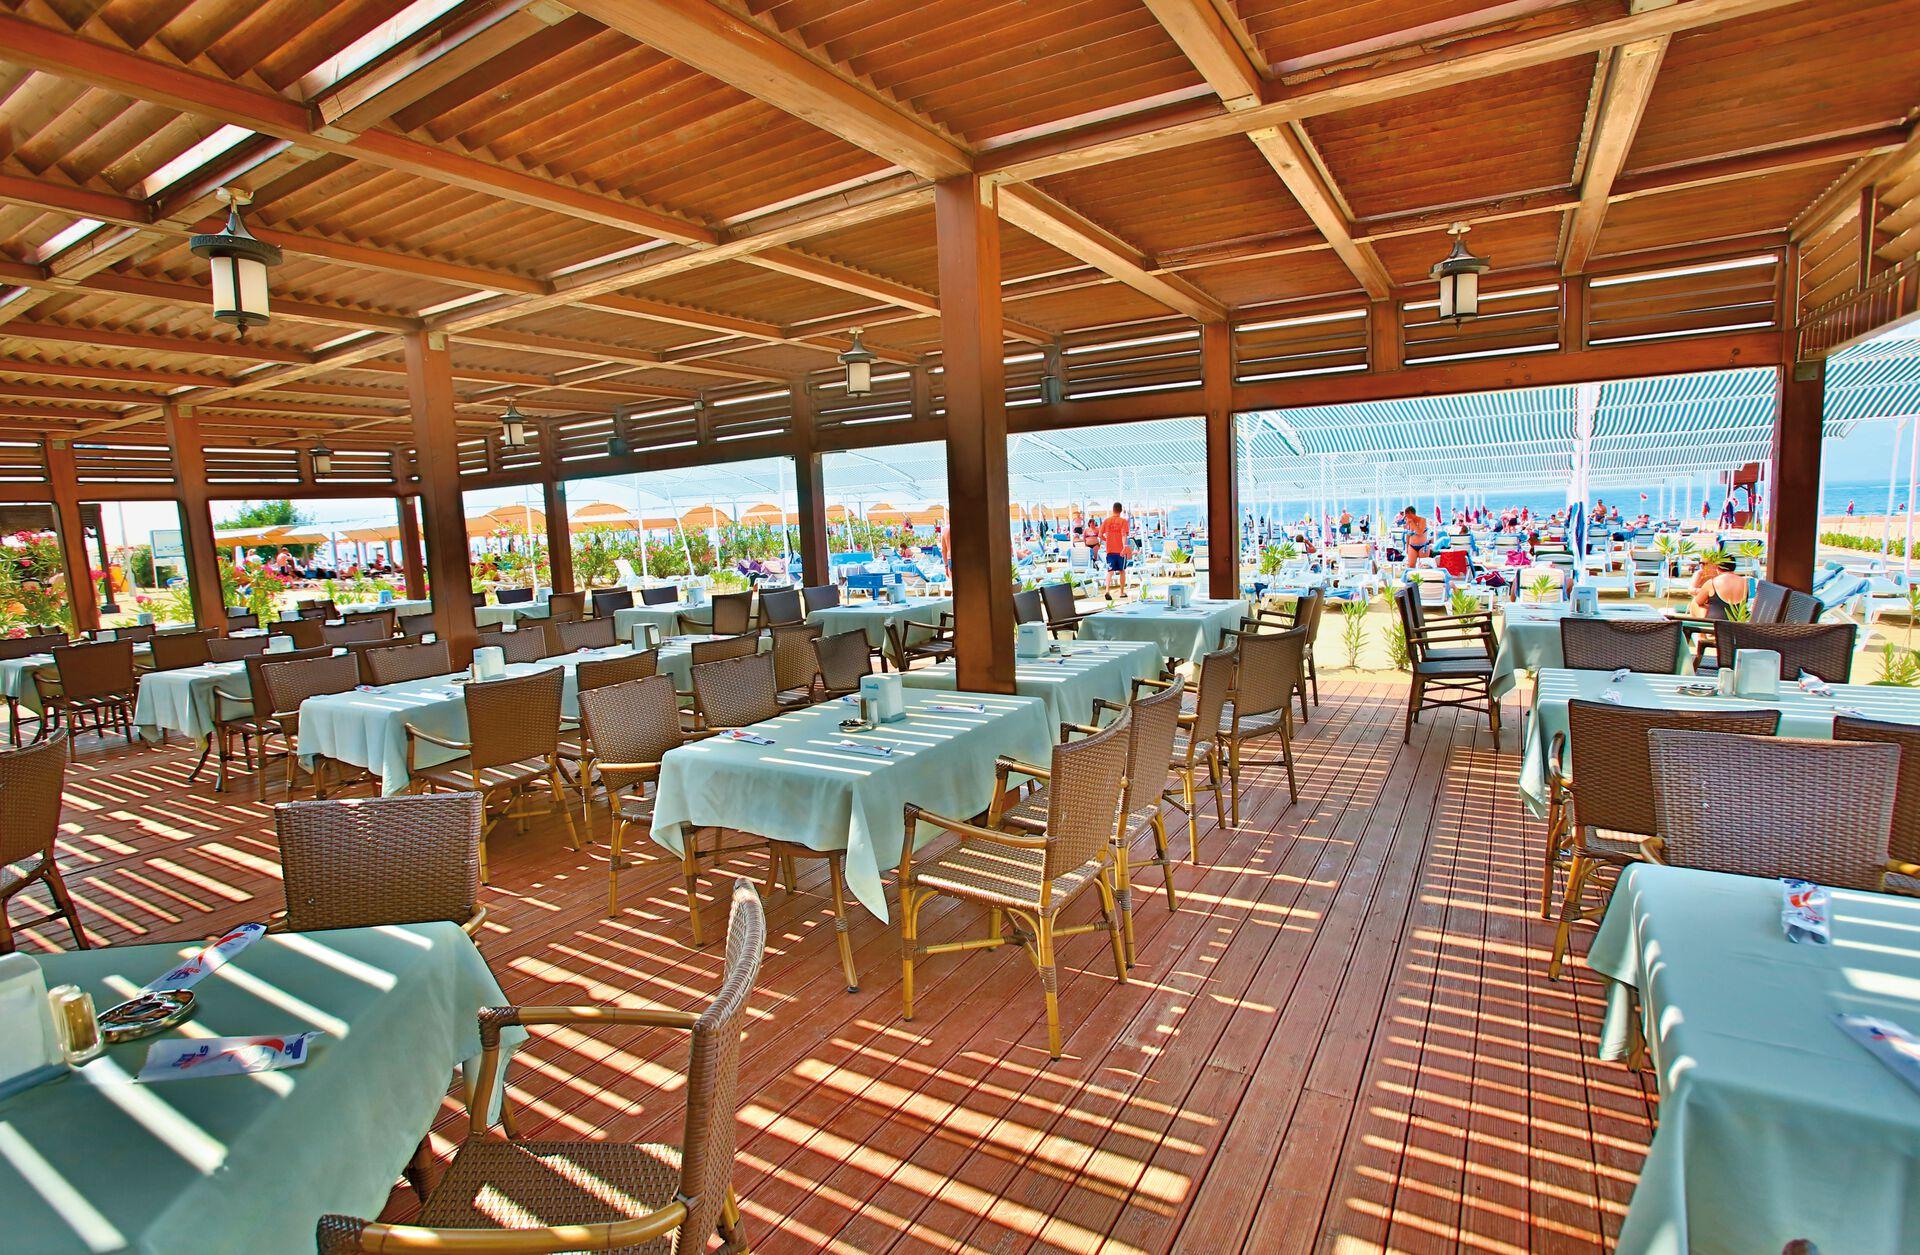 Turquie - Side - Hôtel Sunis Evren Beach Resort & Spa 5*